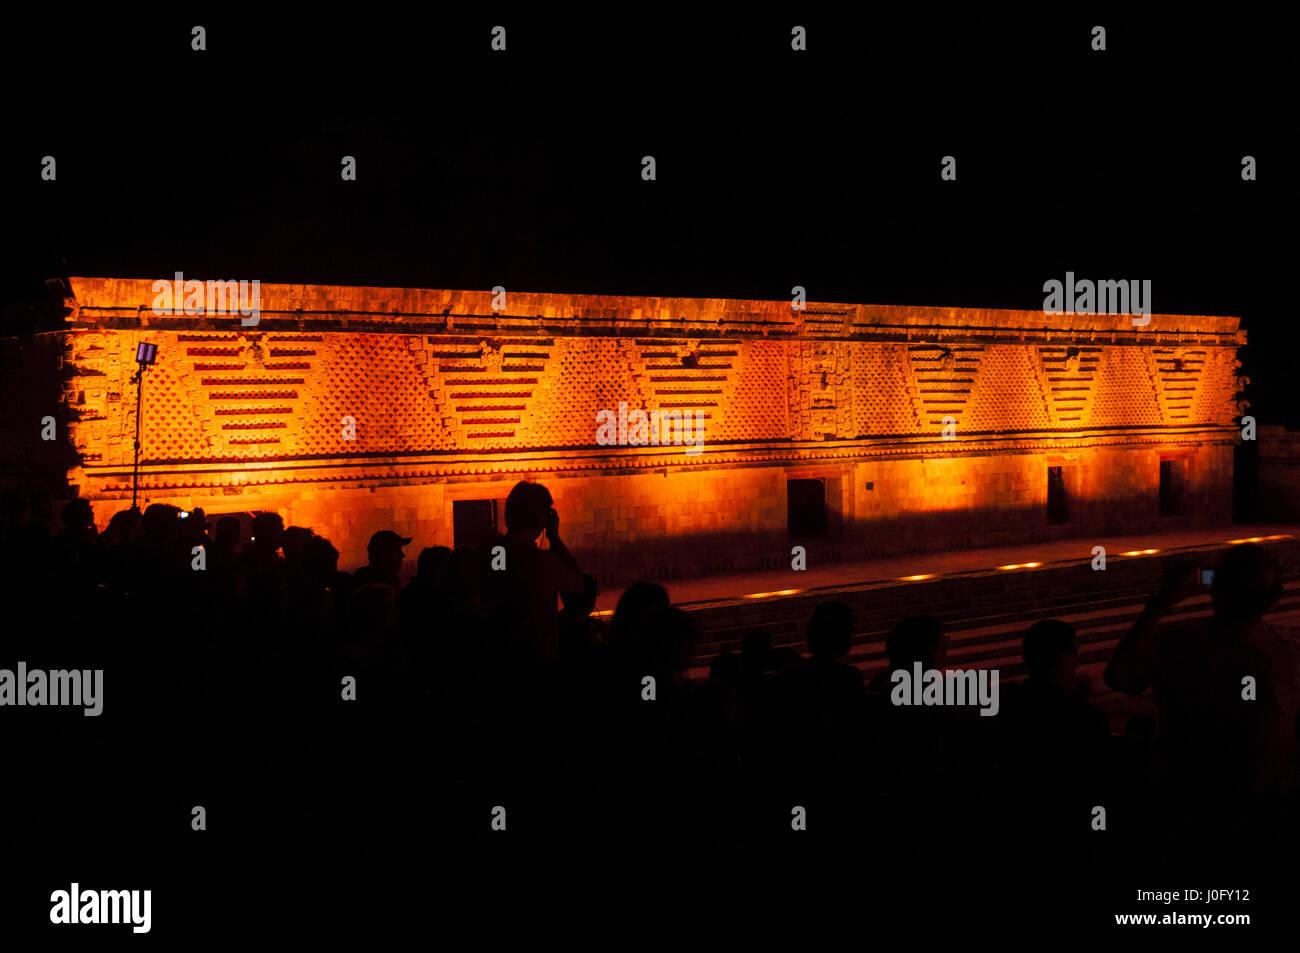 Mexico, Yucatan, Uxmal Mayan site, Nuns' Quadrangle, East Temple - Stock Image